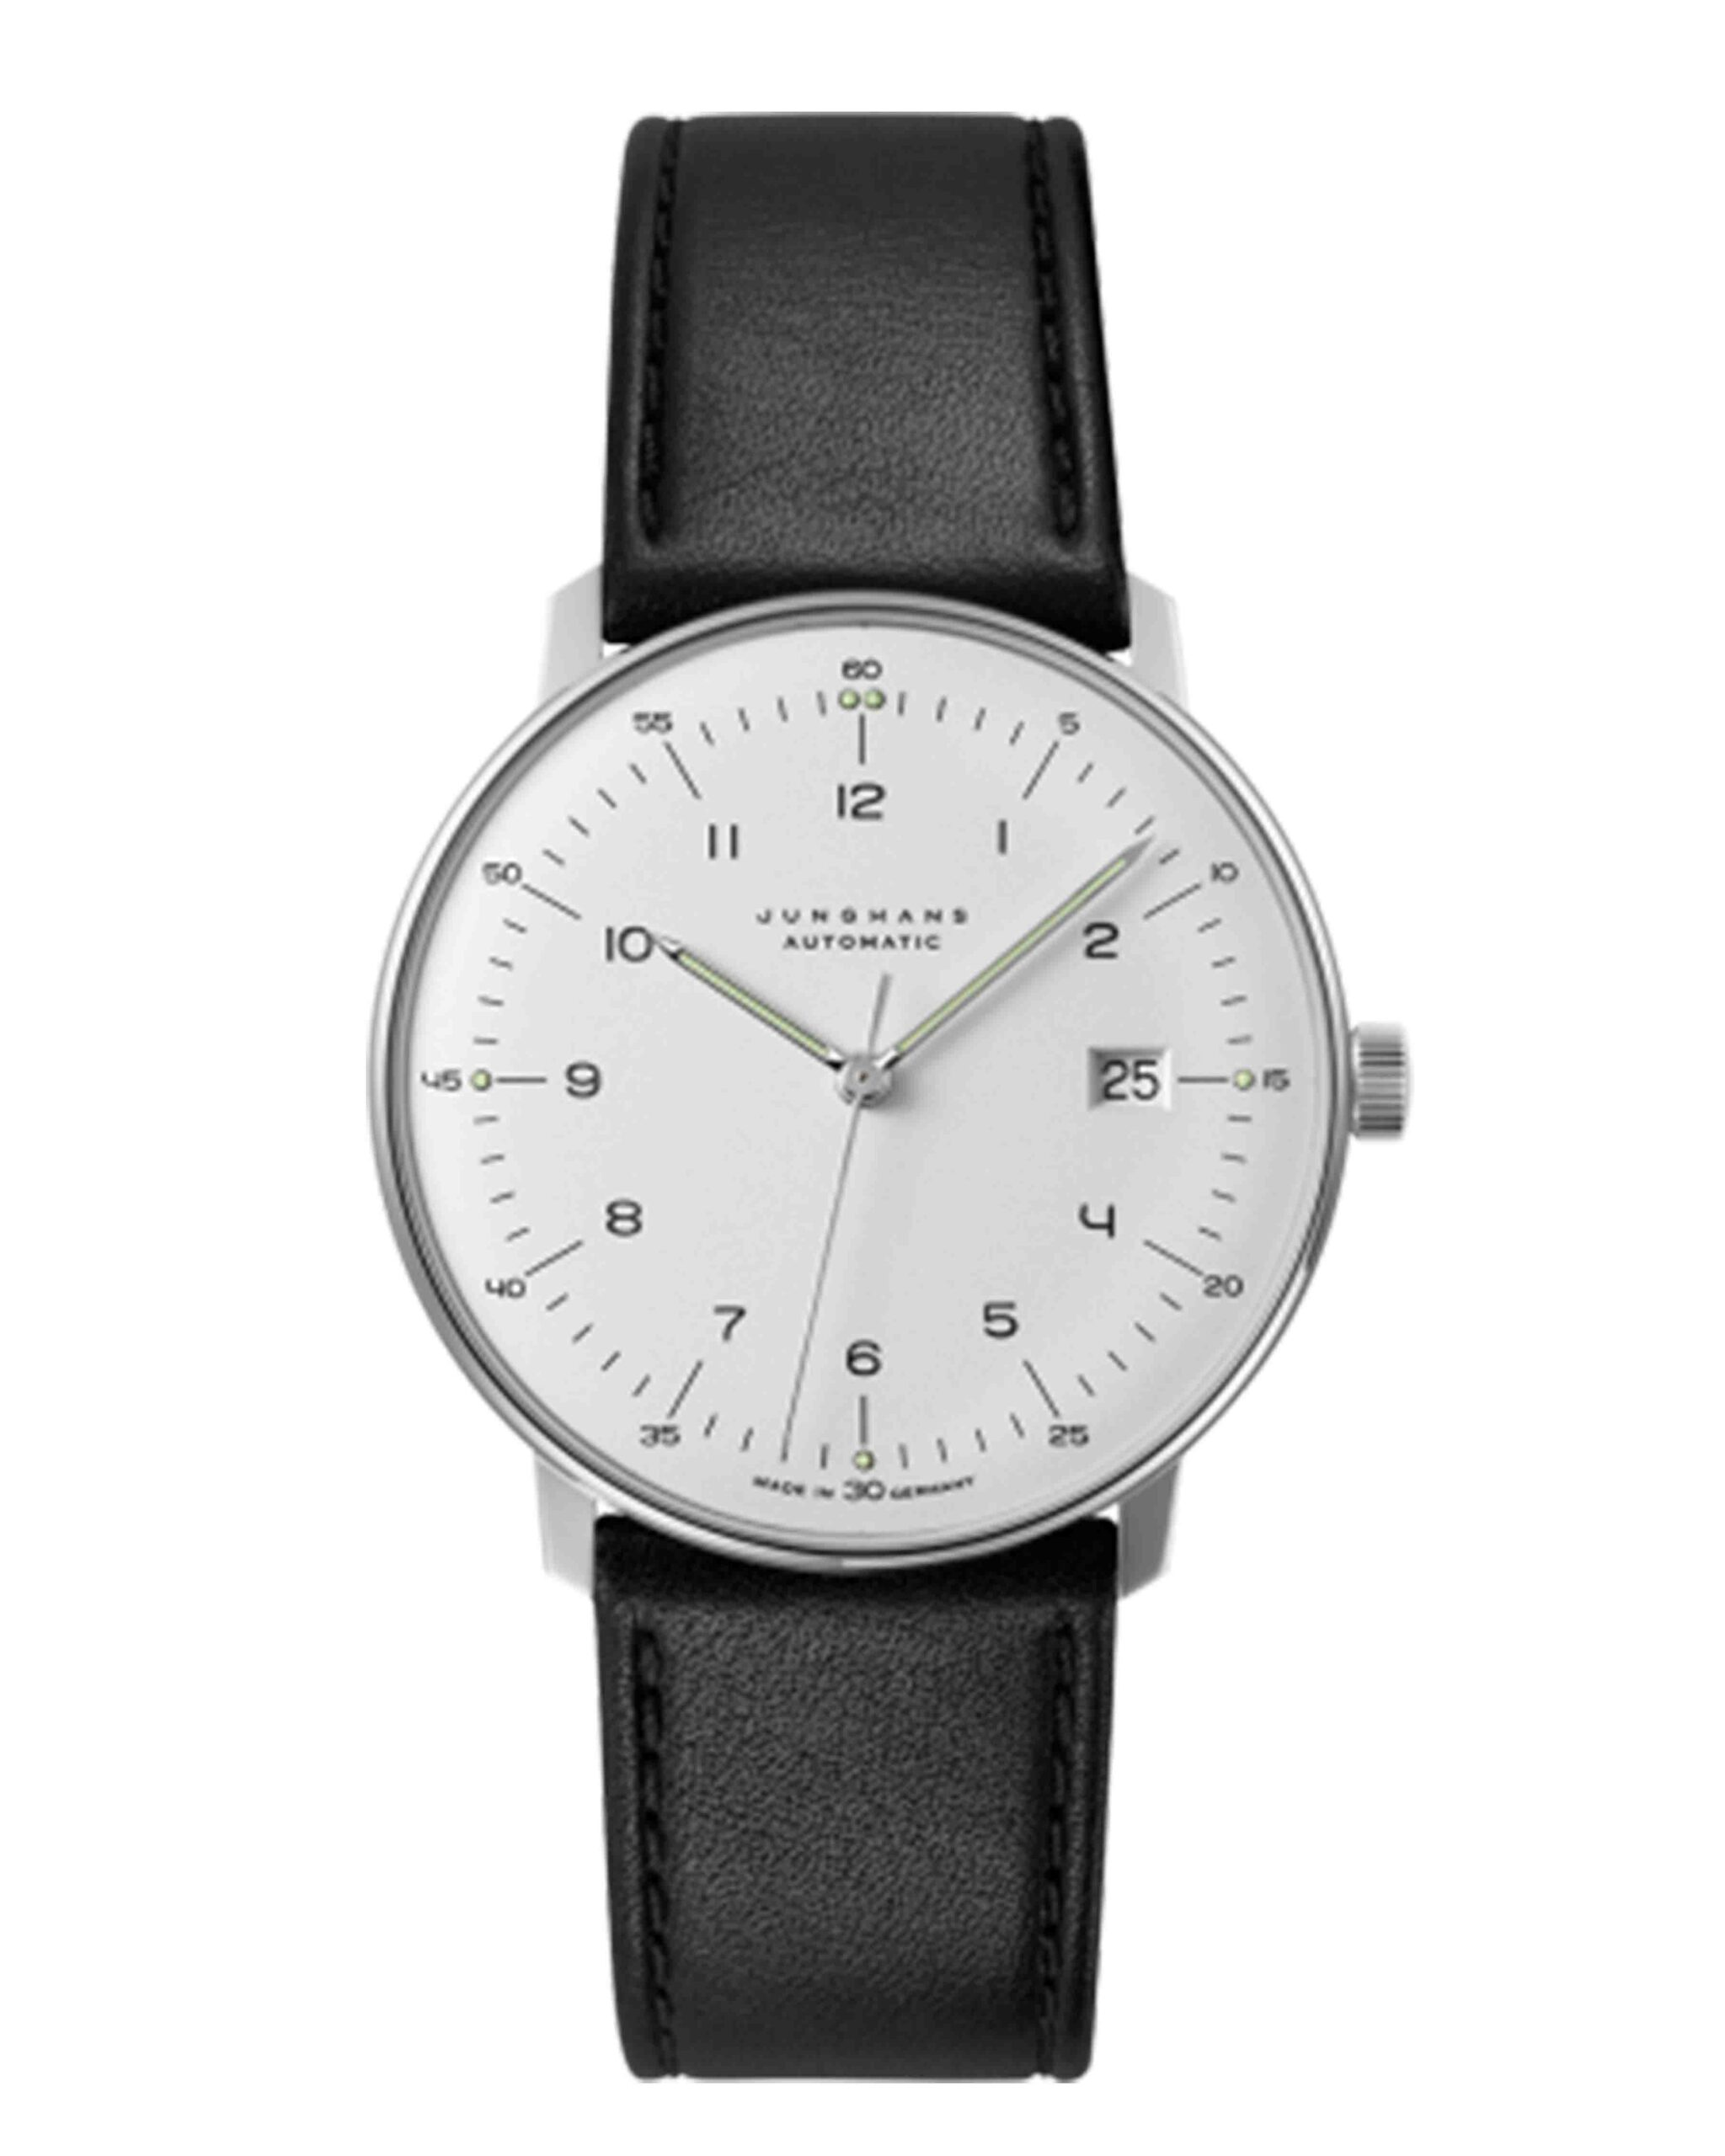 Besten Uhren unter 1000 Euro: Junghans Max Bill Automatic